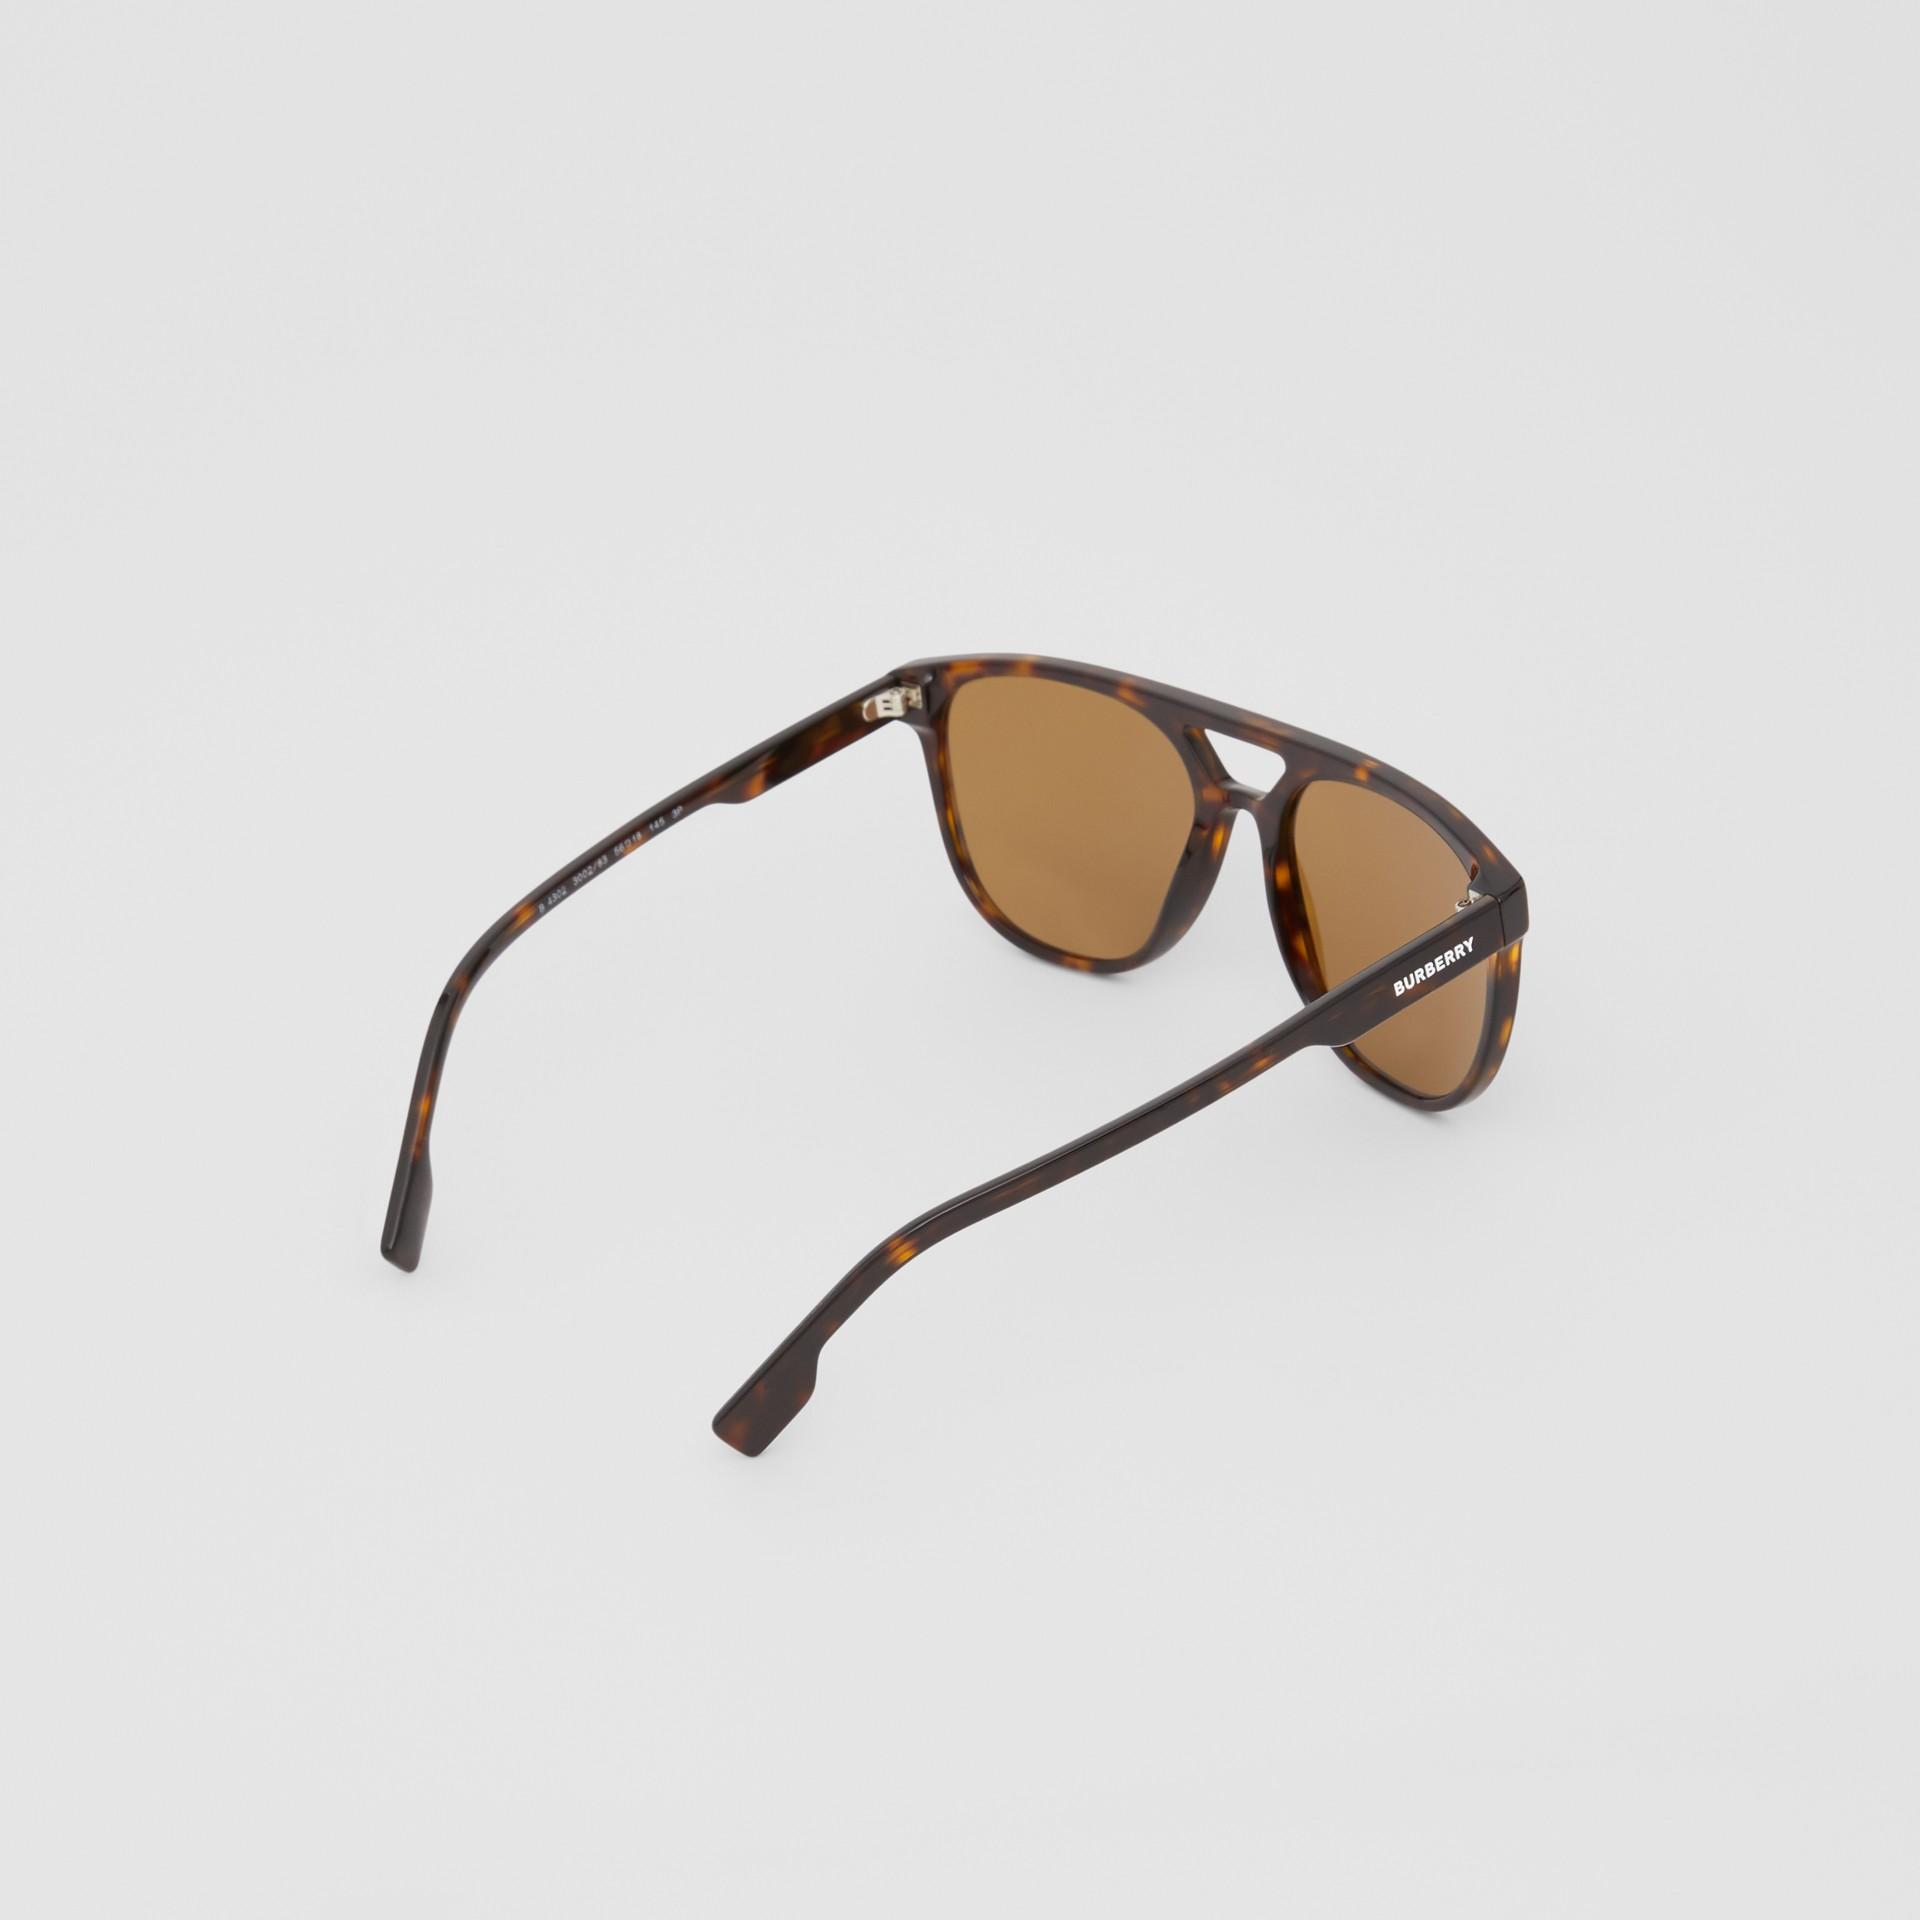 Navigator Sunglasses in Tortoiseshell - Men | Burberry United Kingdom - gallery image 4